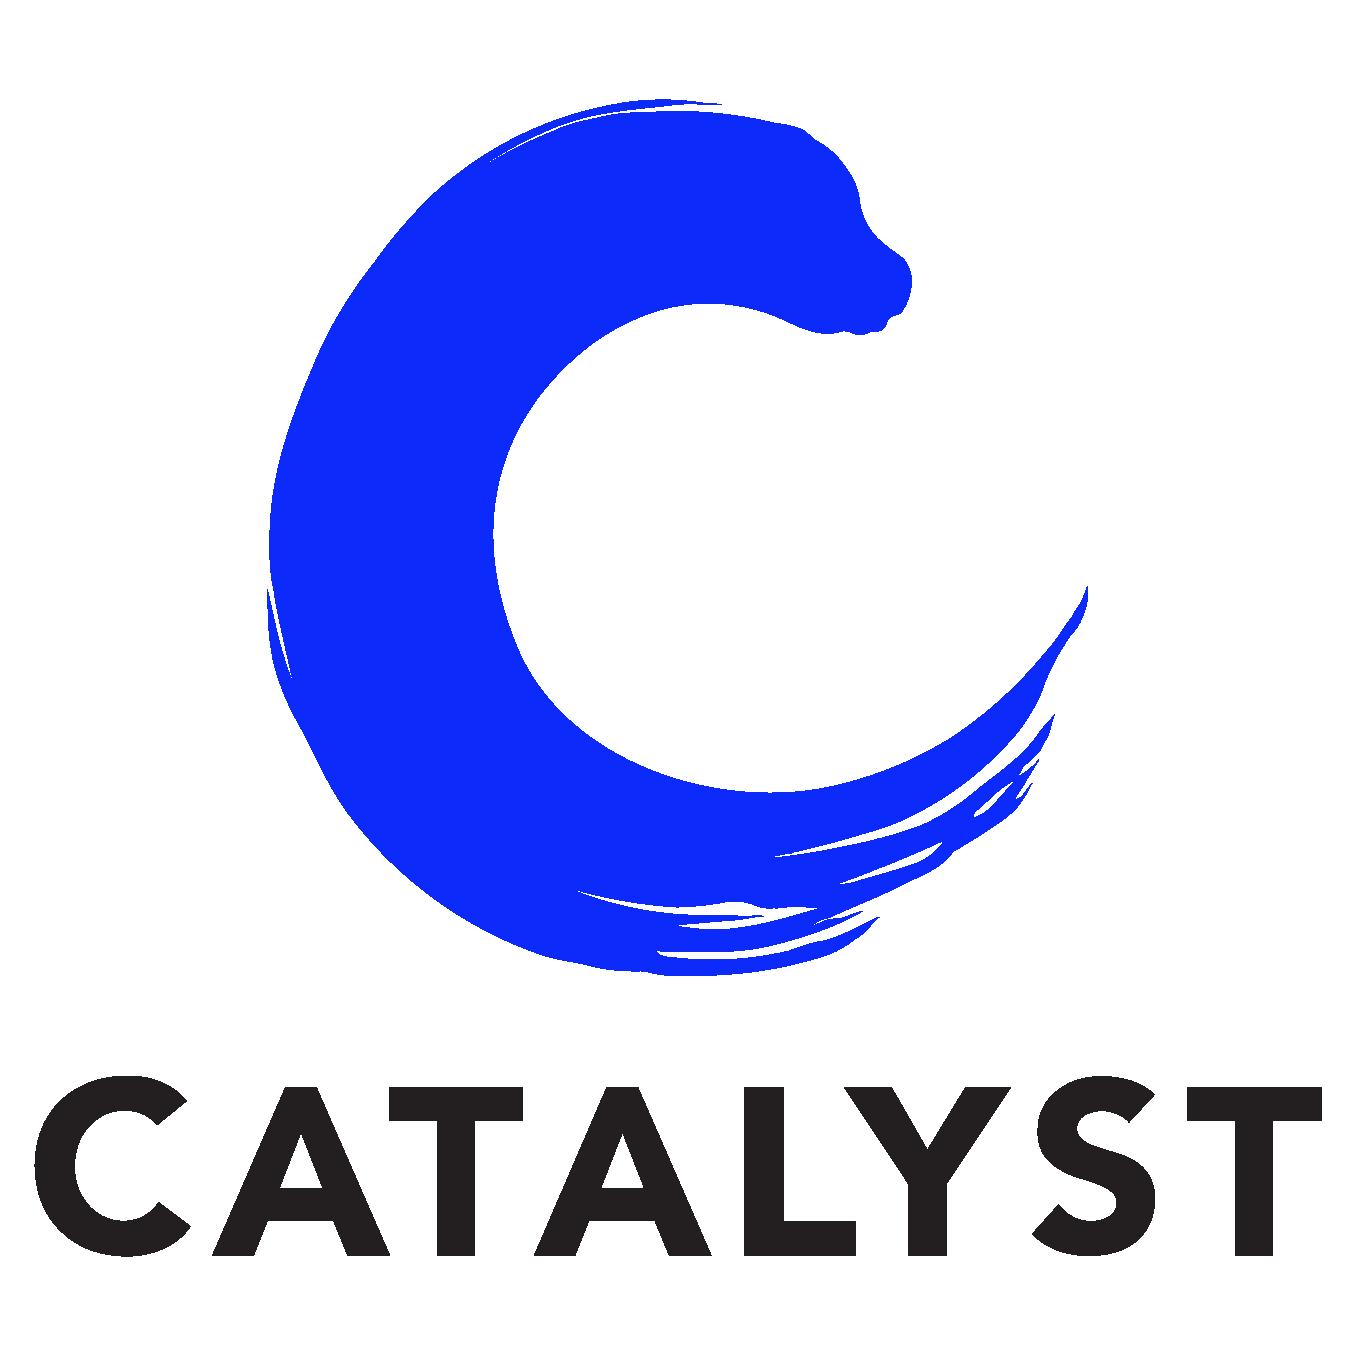 Catalyst Logo png